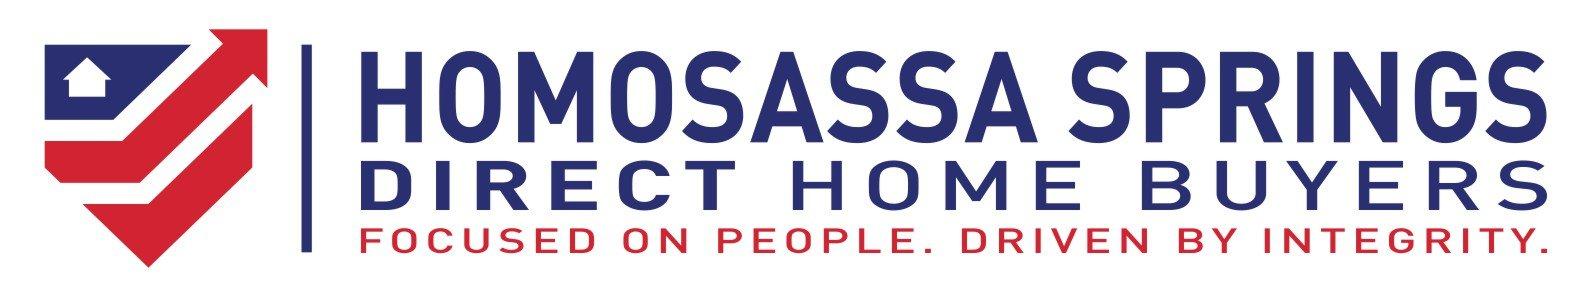 we buy houses Homosassa Springs FL | logo